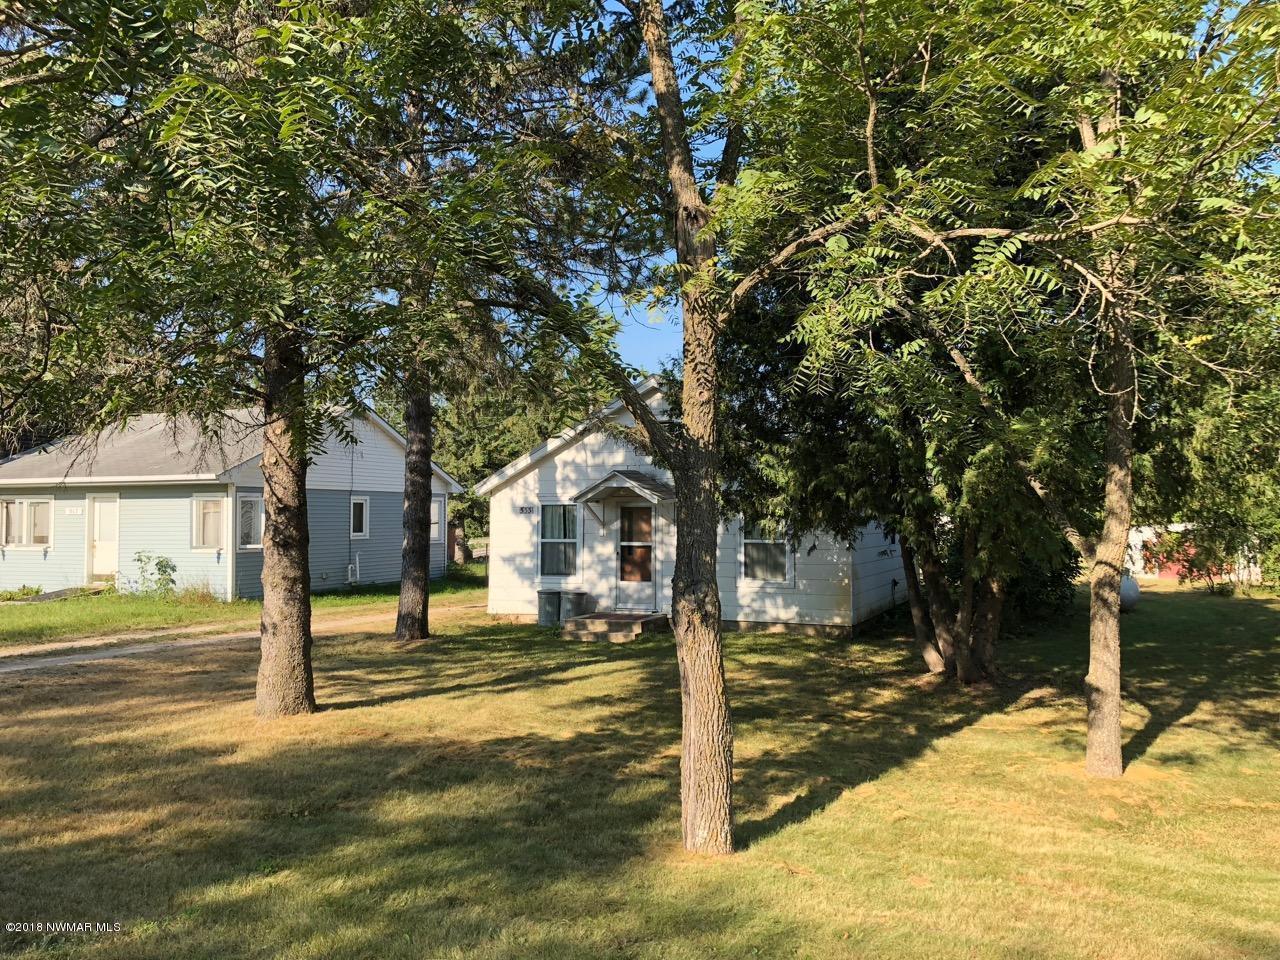 533 Main N Property Photo - Blackduck, MN real estate listing